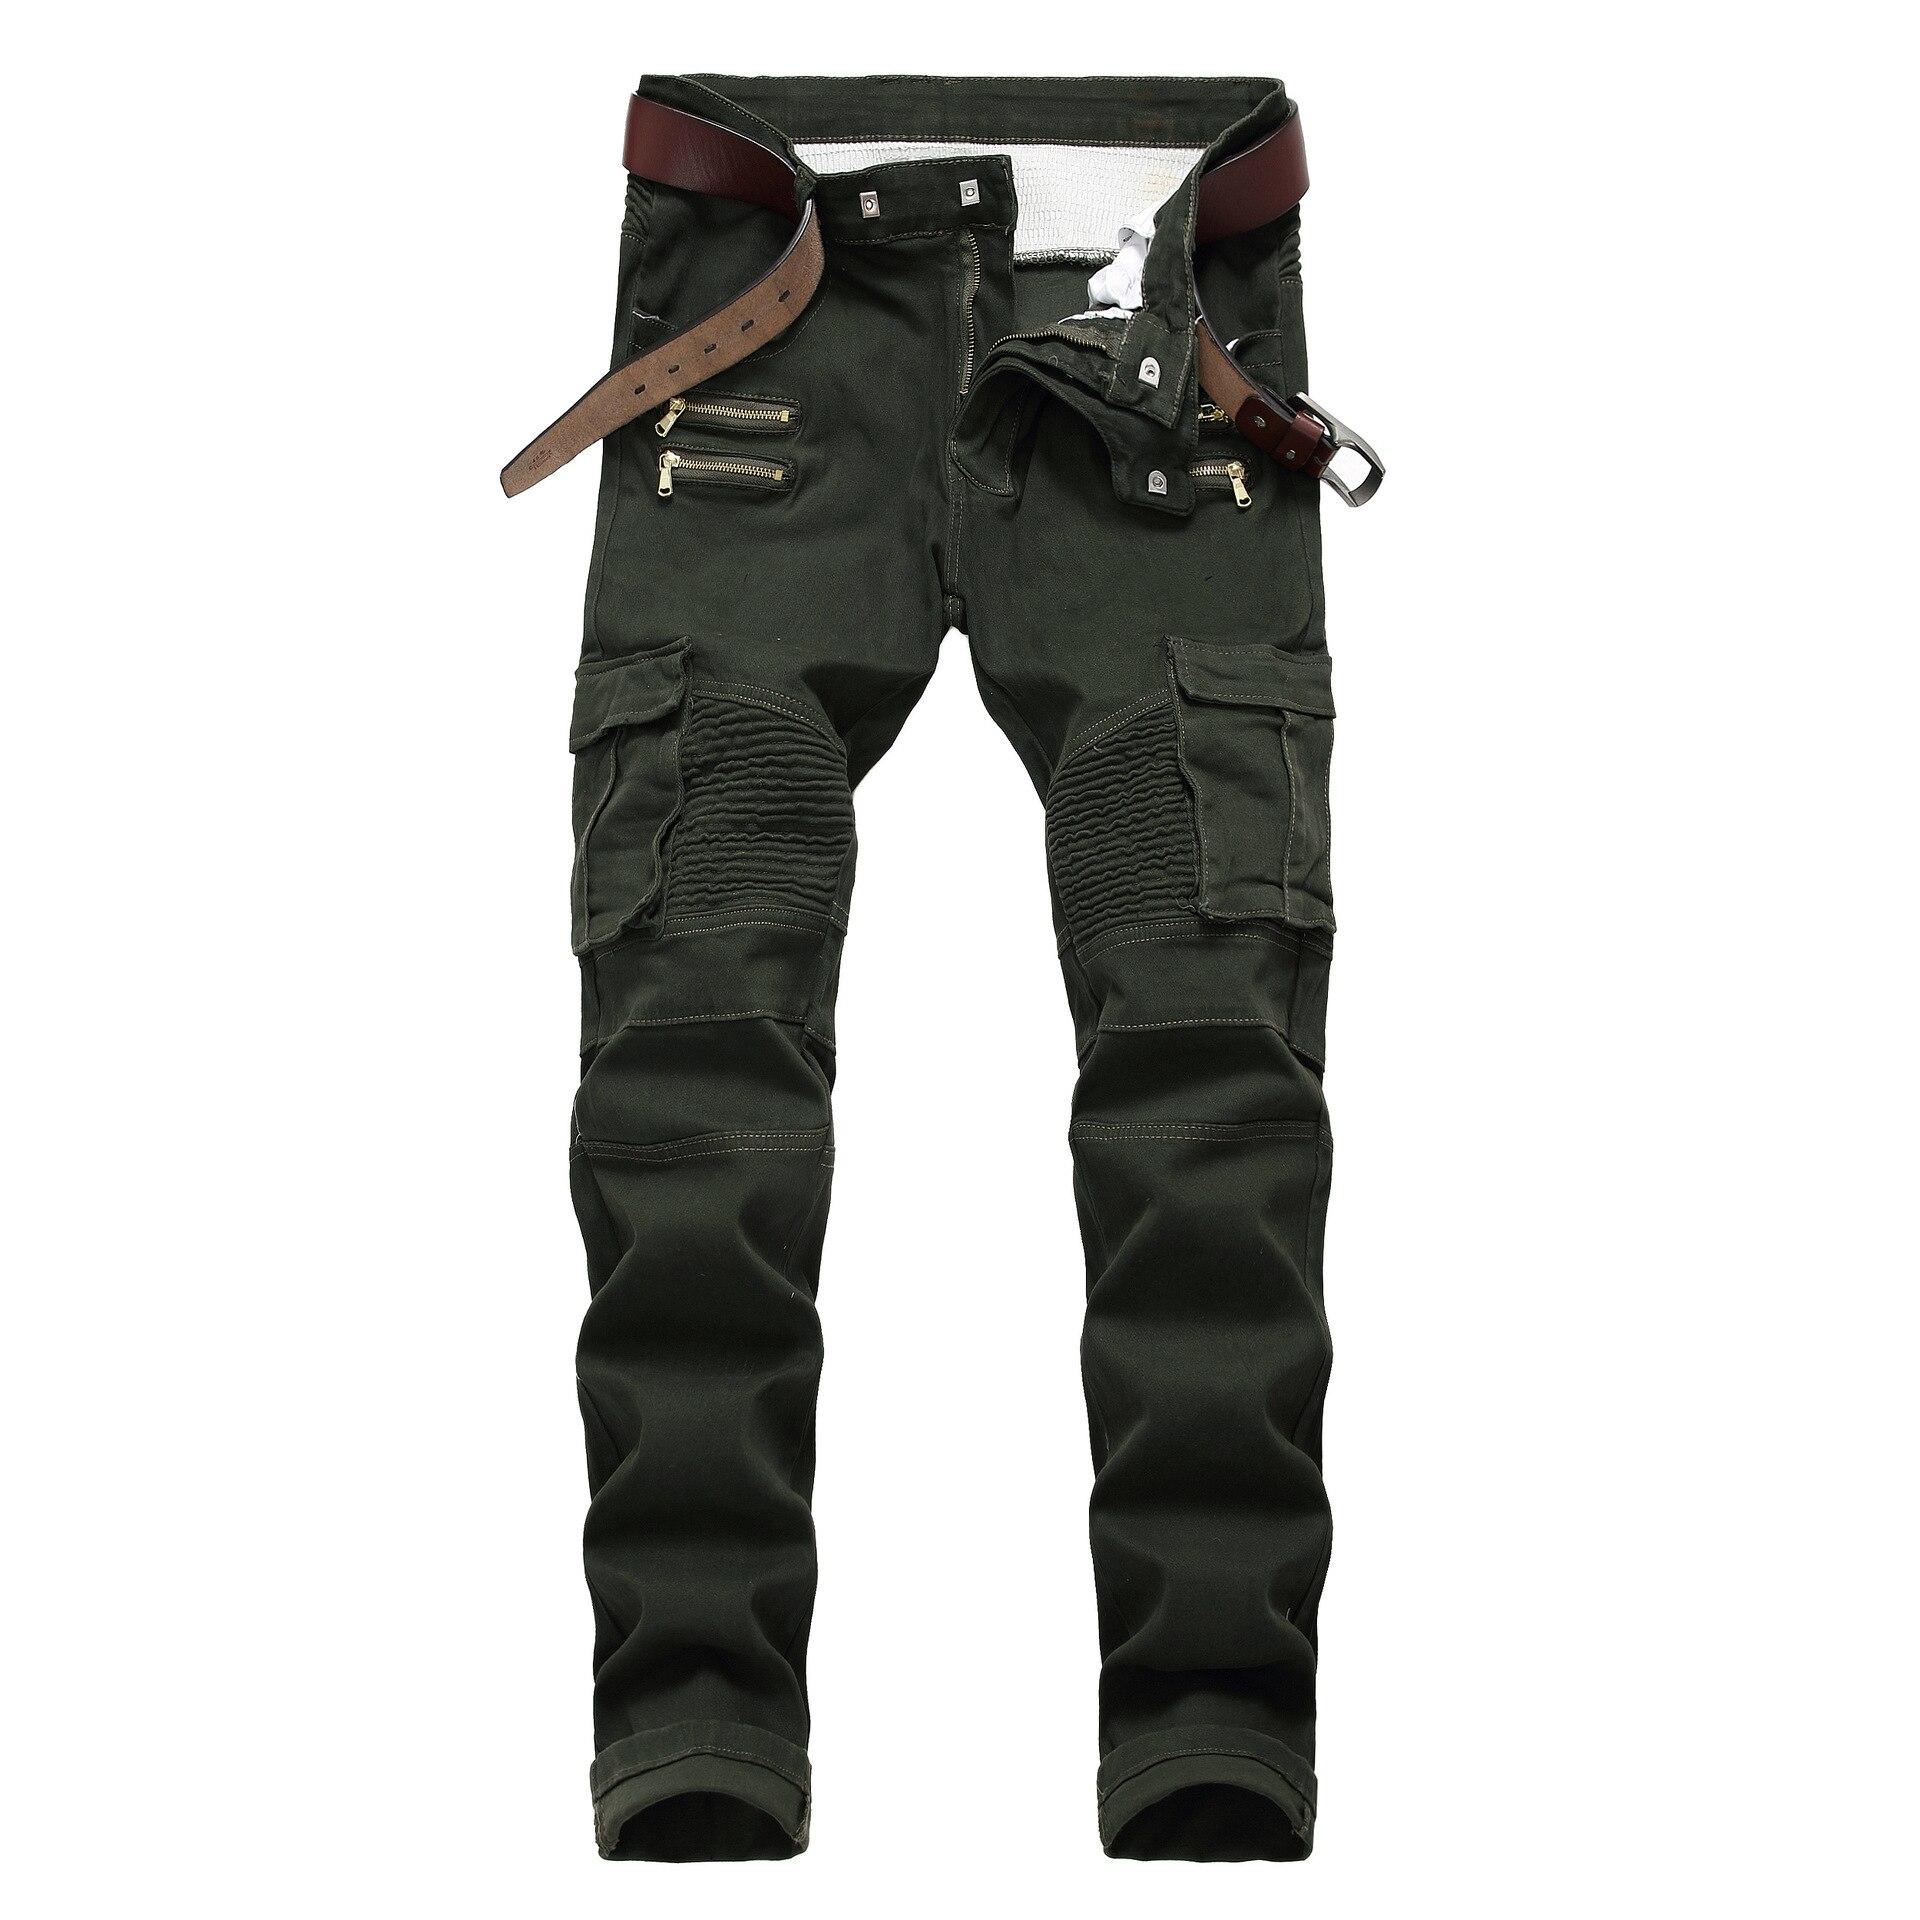 Mens Skinny Cargo Jeans Vintage Blue Wash Moto Biker Distressed Rips Zippers 32